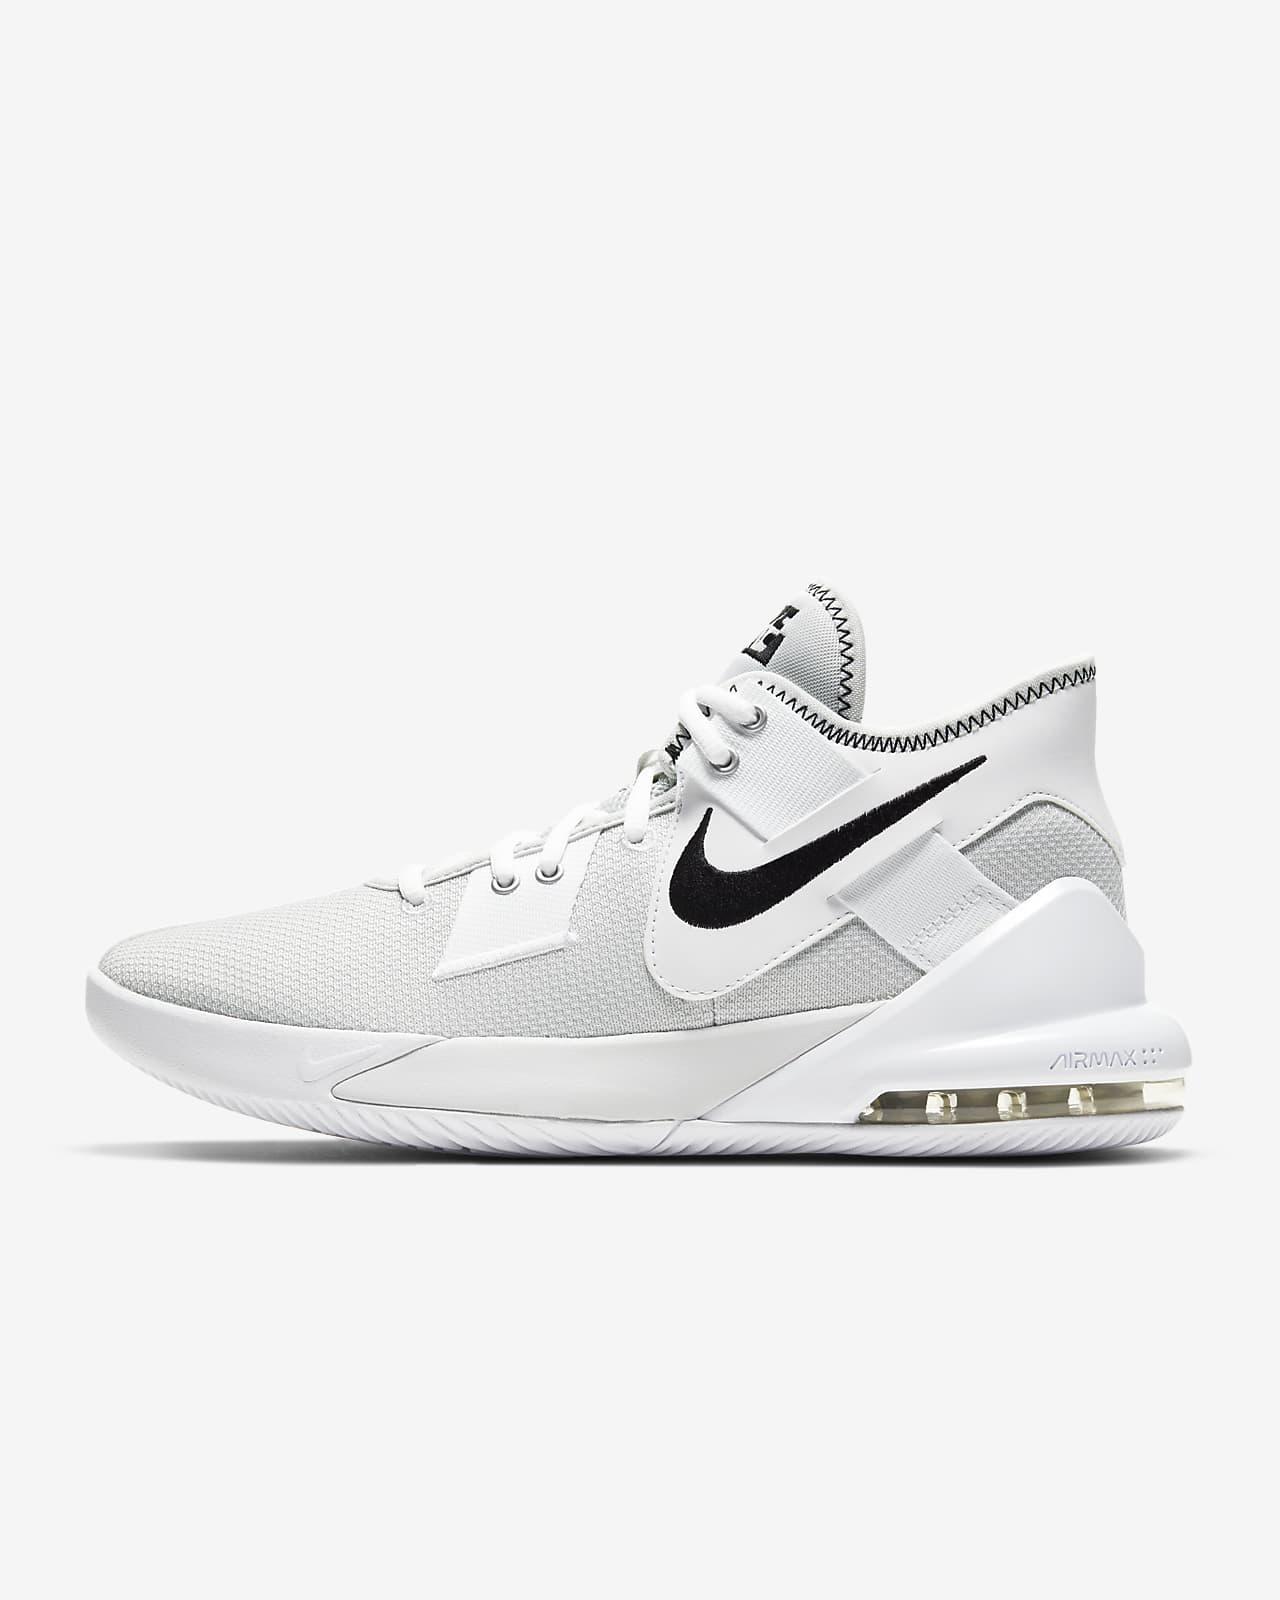 Nike Air Max Impact 2 Basketball Shoes